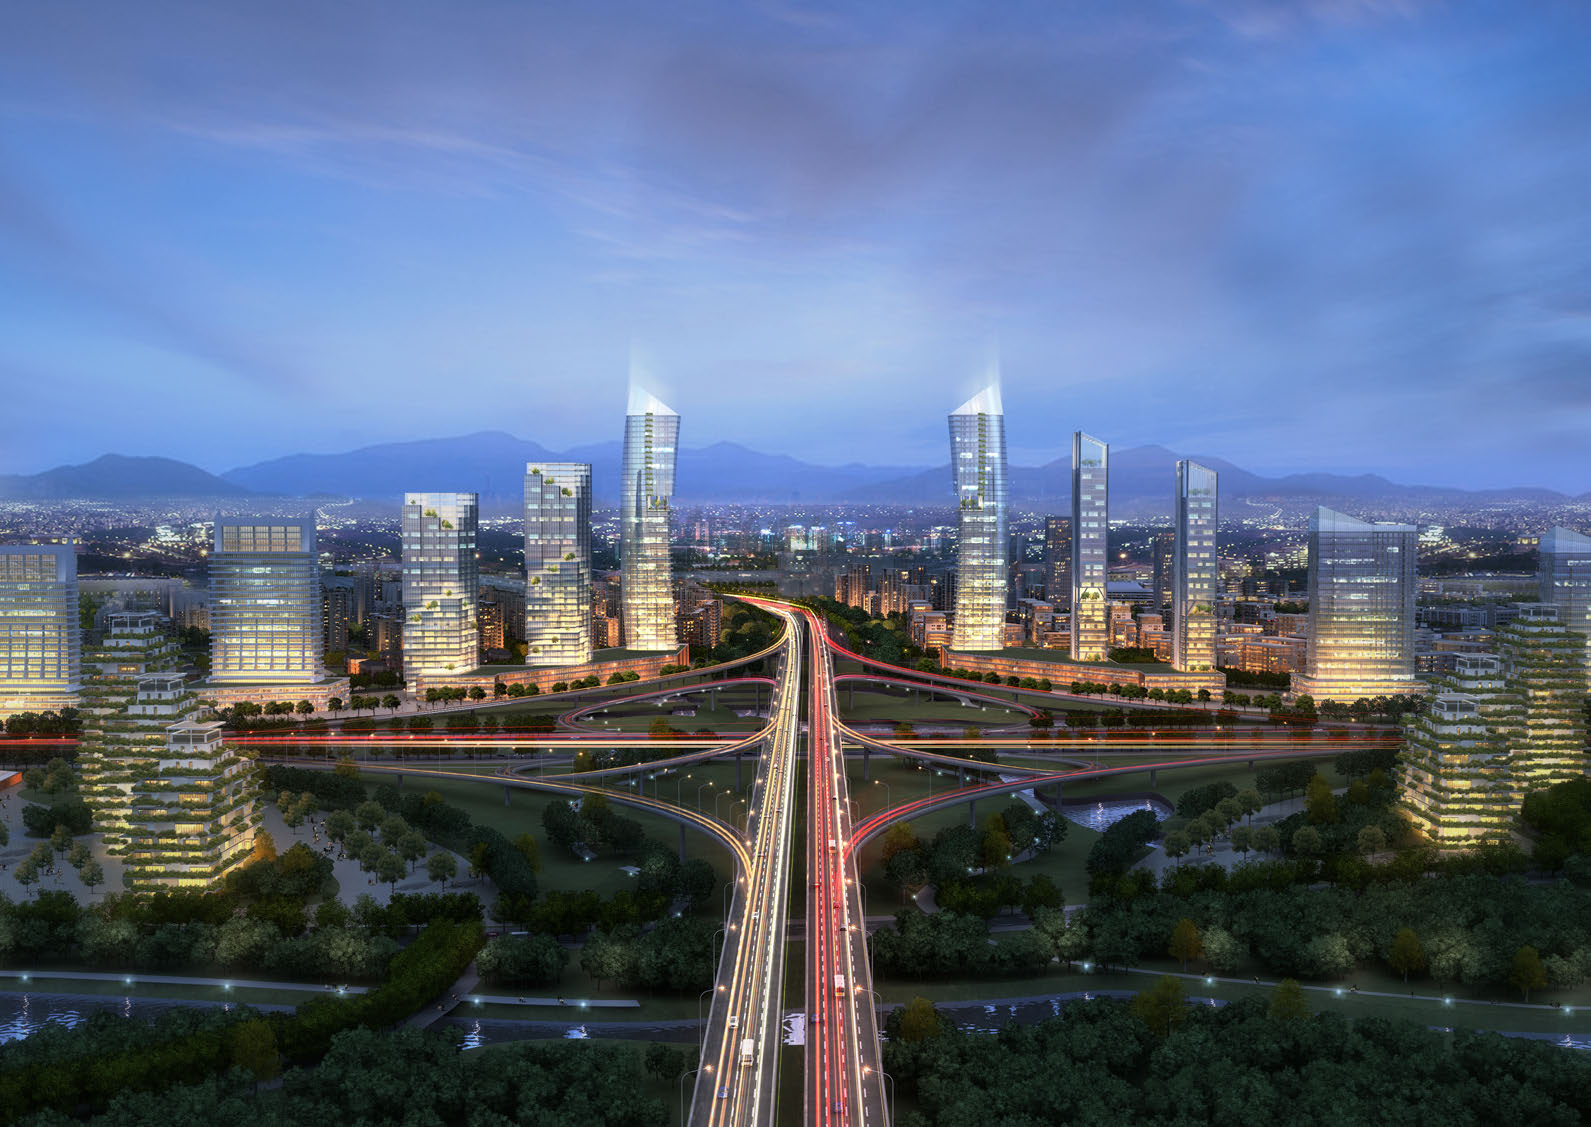 Assembledge, Hangzhou, Urban Planning, Rendering, Towers